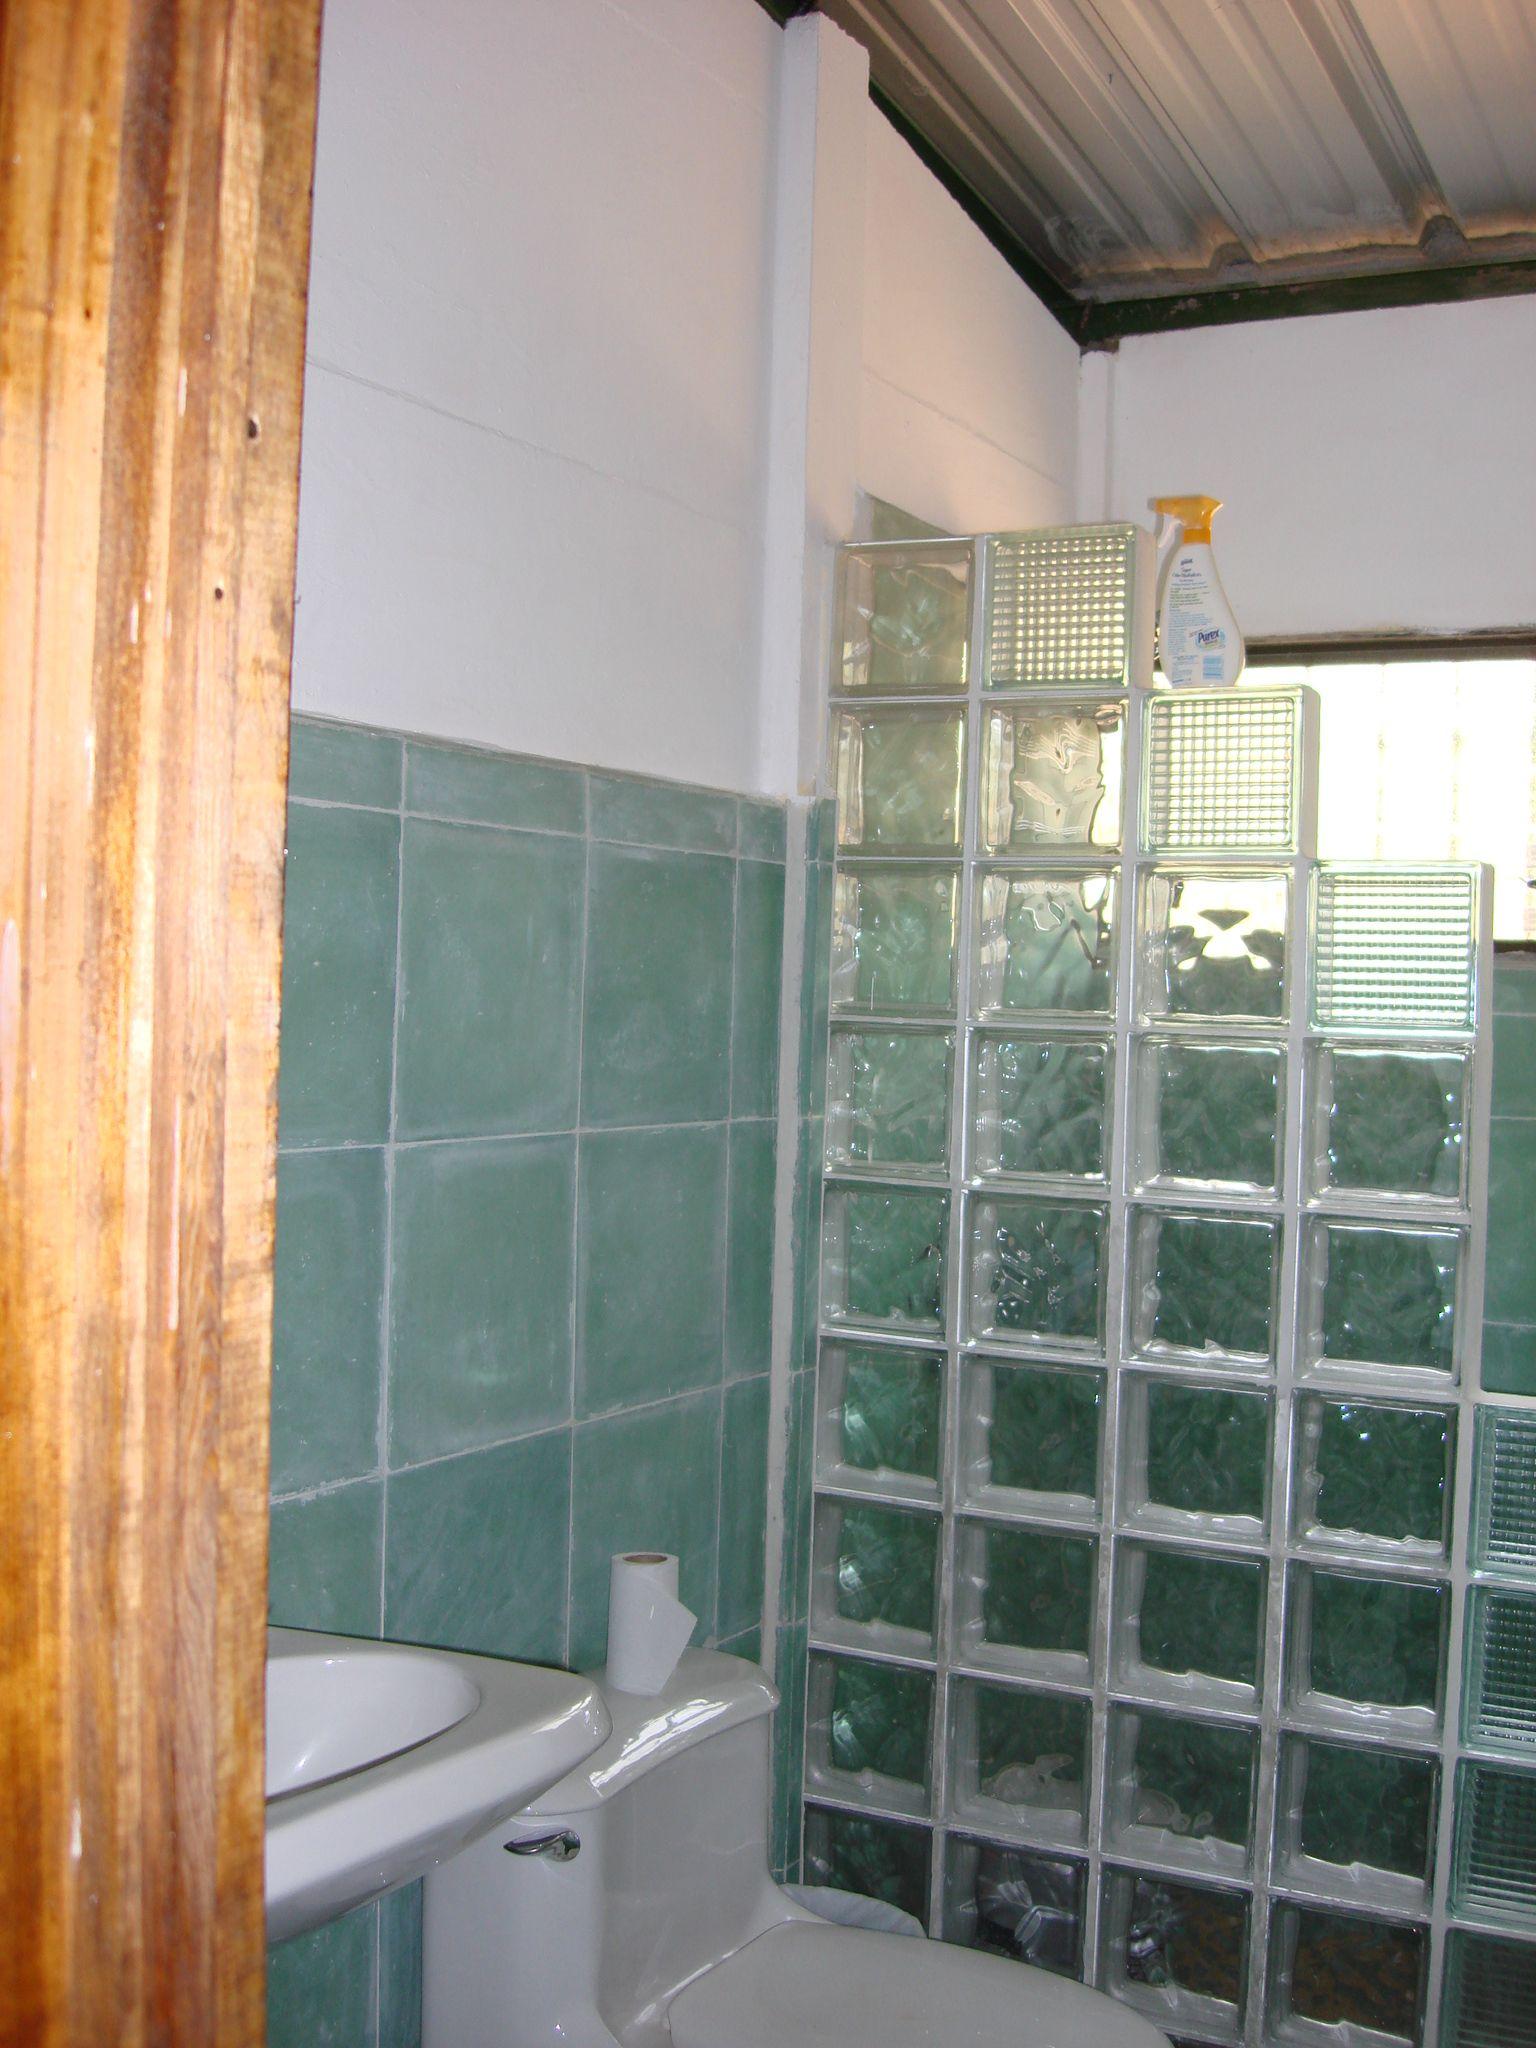 bloque #Vidrio #prefabricado #econsaconstructores | Decorar Casas ...